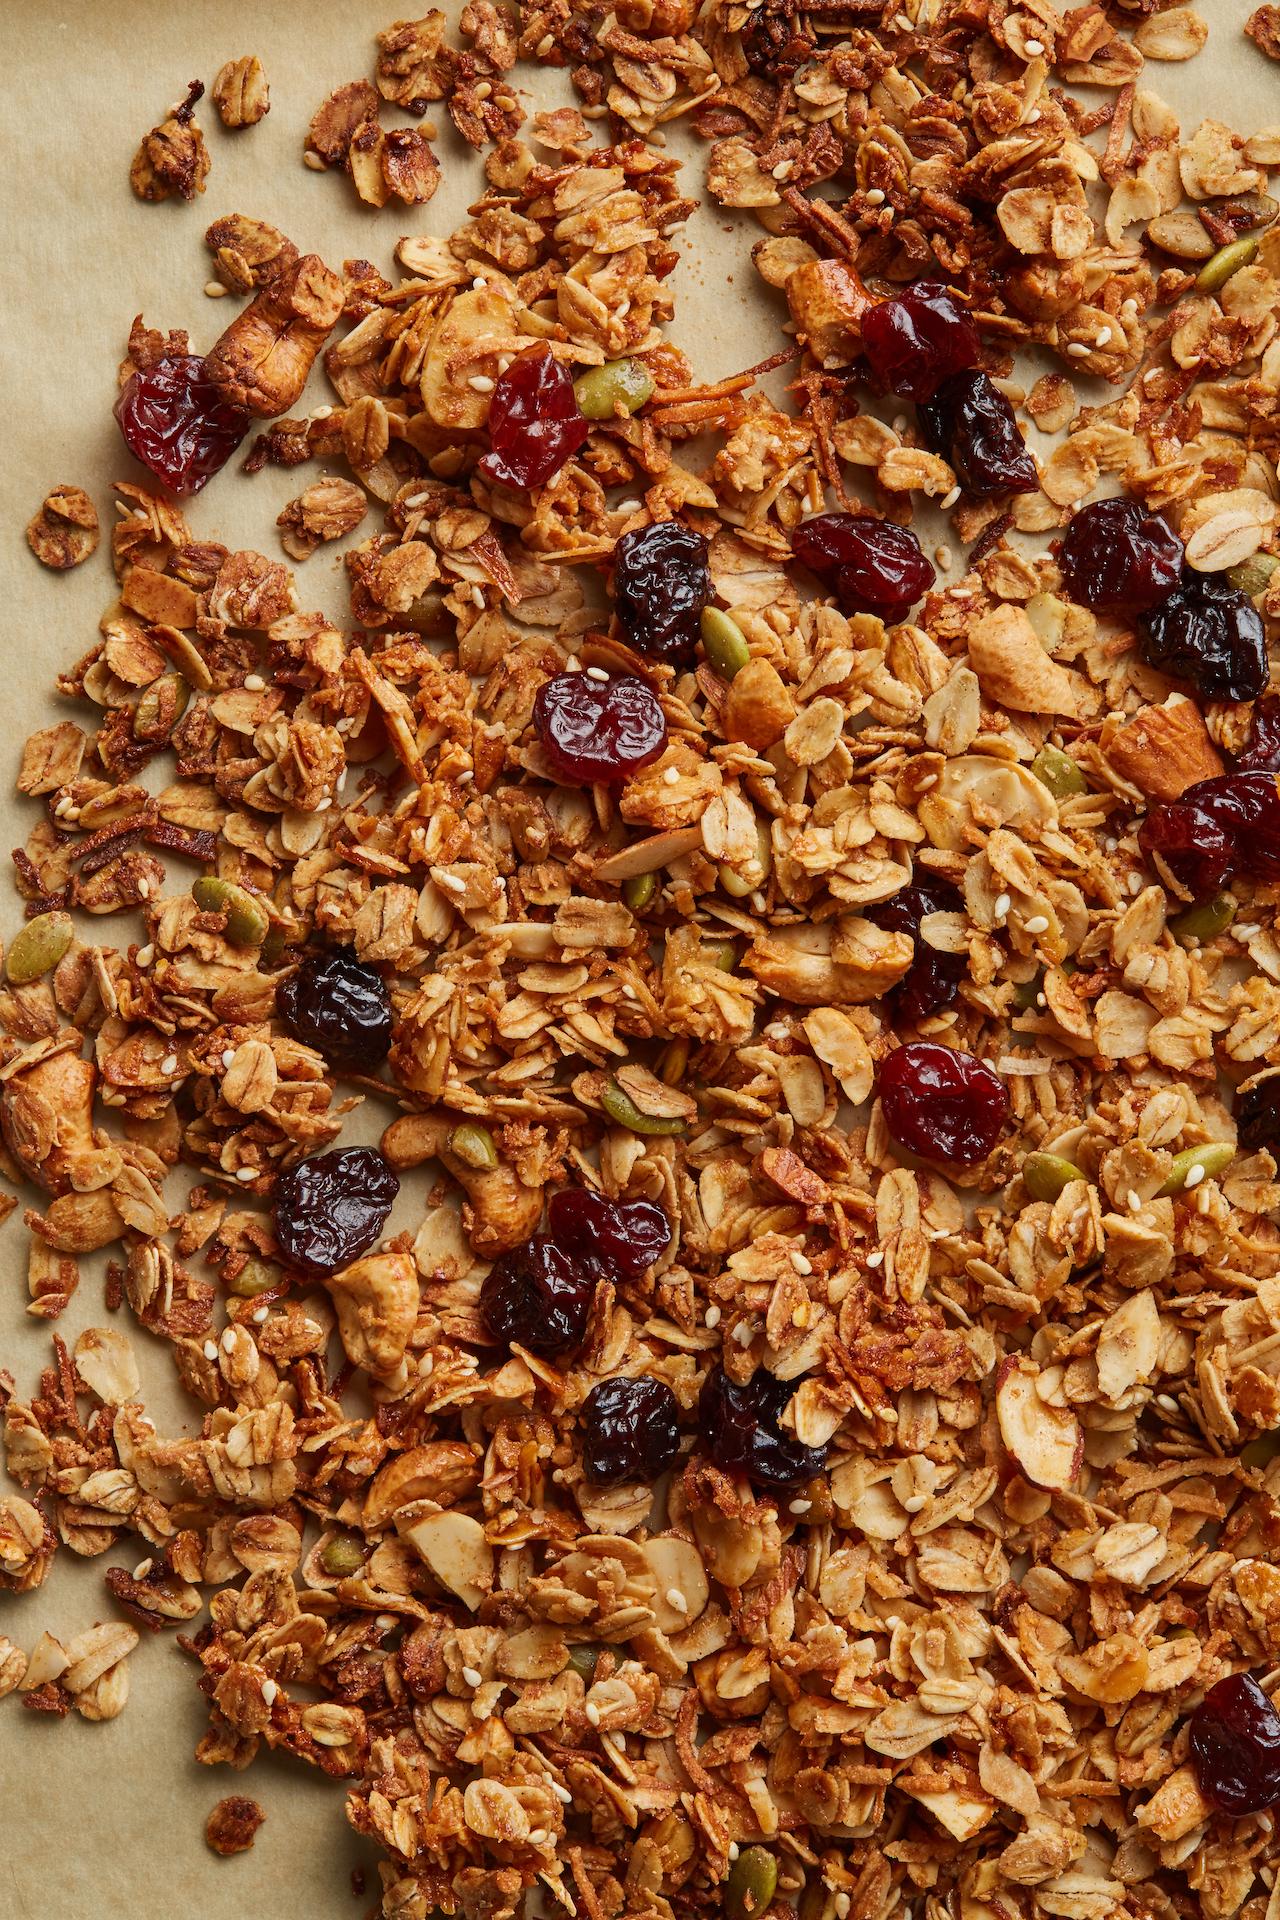 Coconut Almond Granola - Nut Butter Granola ParfaitBanana Granola BarsApple Blackberry Granola Crumble